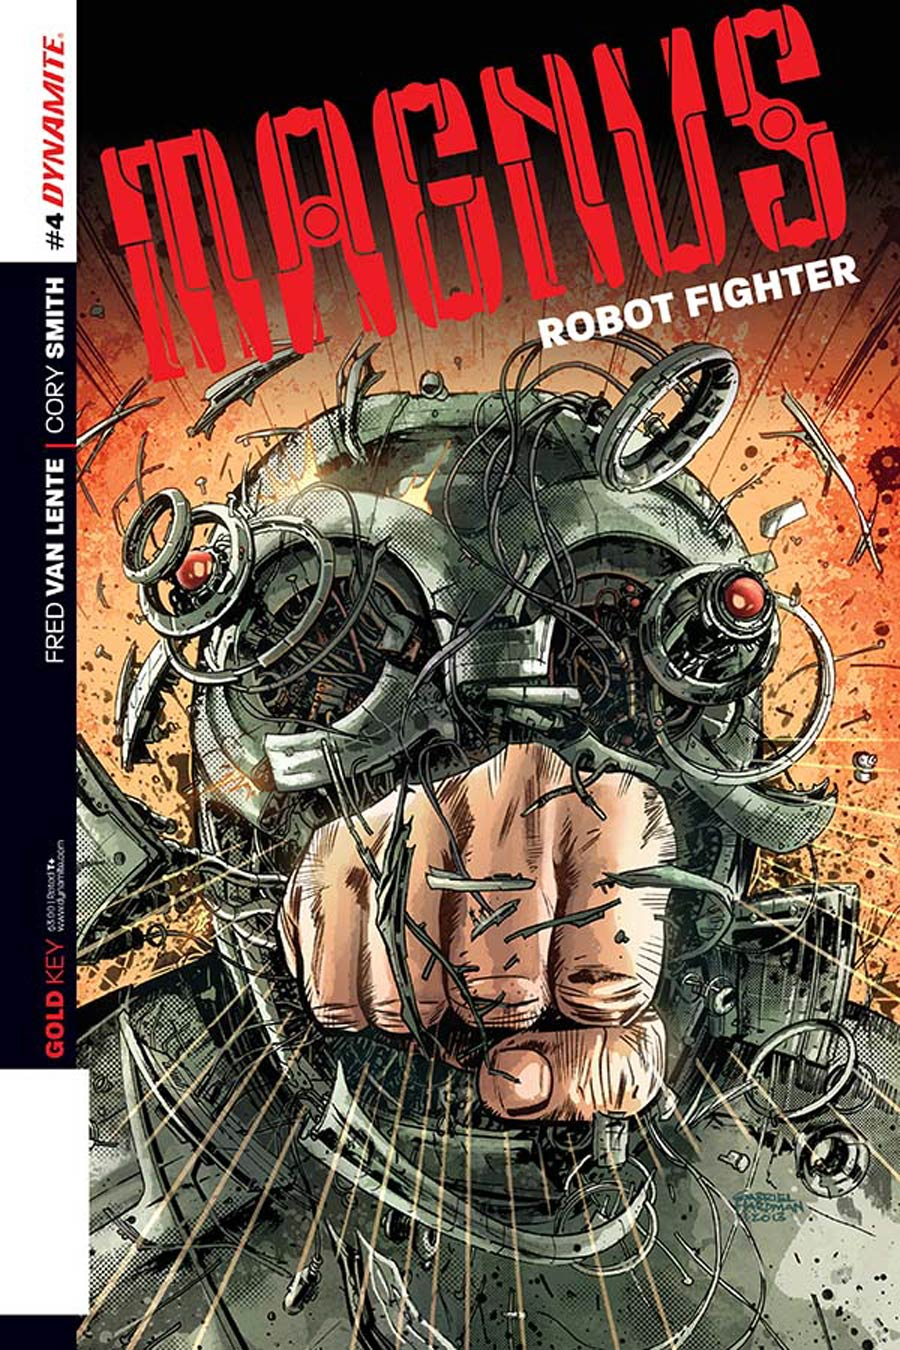 Magnus Robot Fighter Vol 4 #4 Cover A Regular Gabriel Hardman